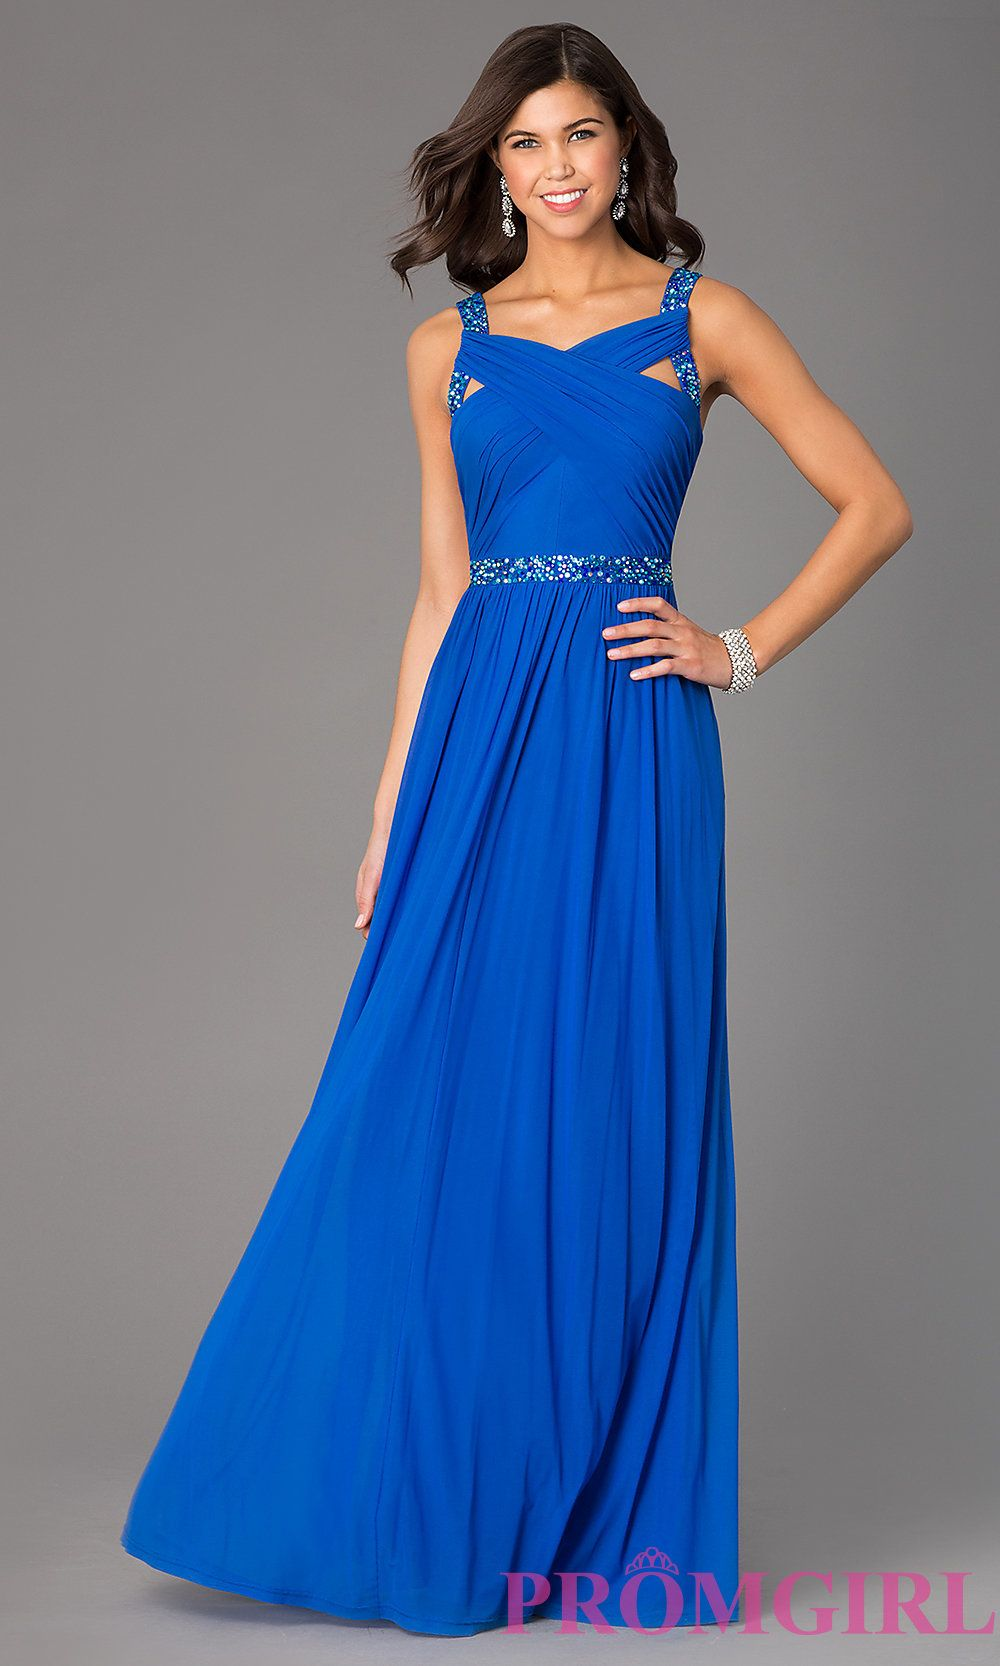 Floor length sleeveless dress by hailey logan promformal